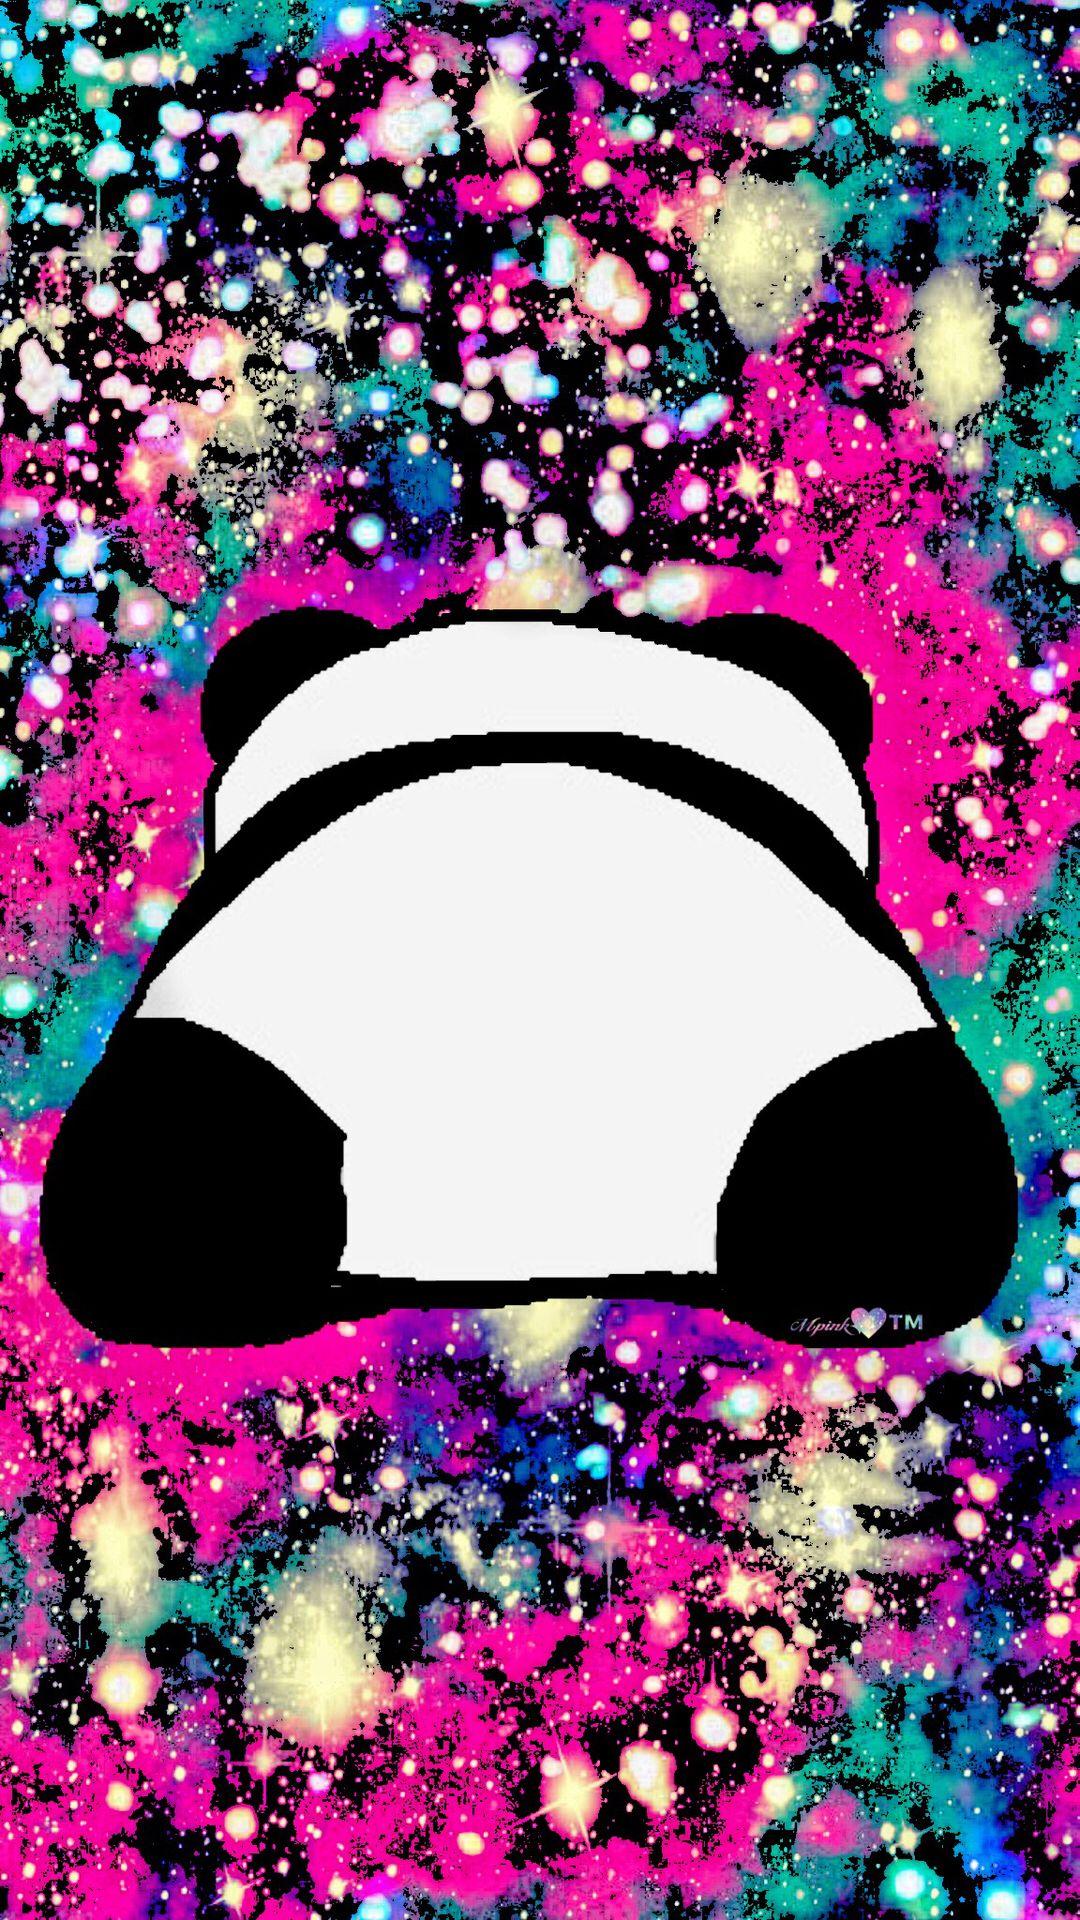 Cute Panda Galaxy Wallpaper Androidwallpaper Iphonewallpaper Wallpaper Galaxy Sparkle Glit Cute Animal Drawings Kawaii Panda Wallpapers Colorful Drawings